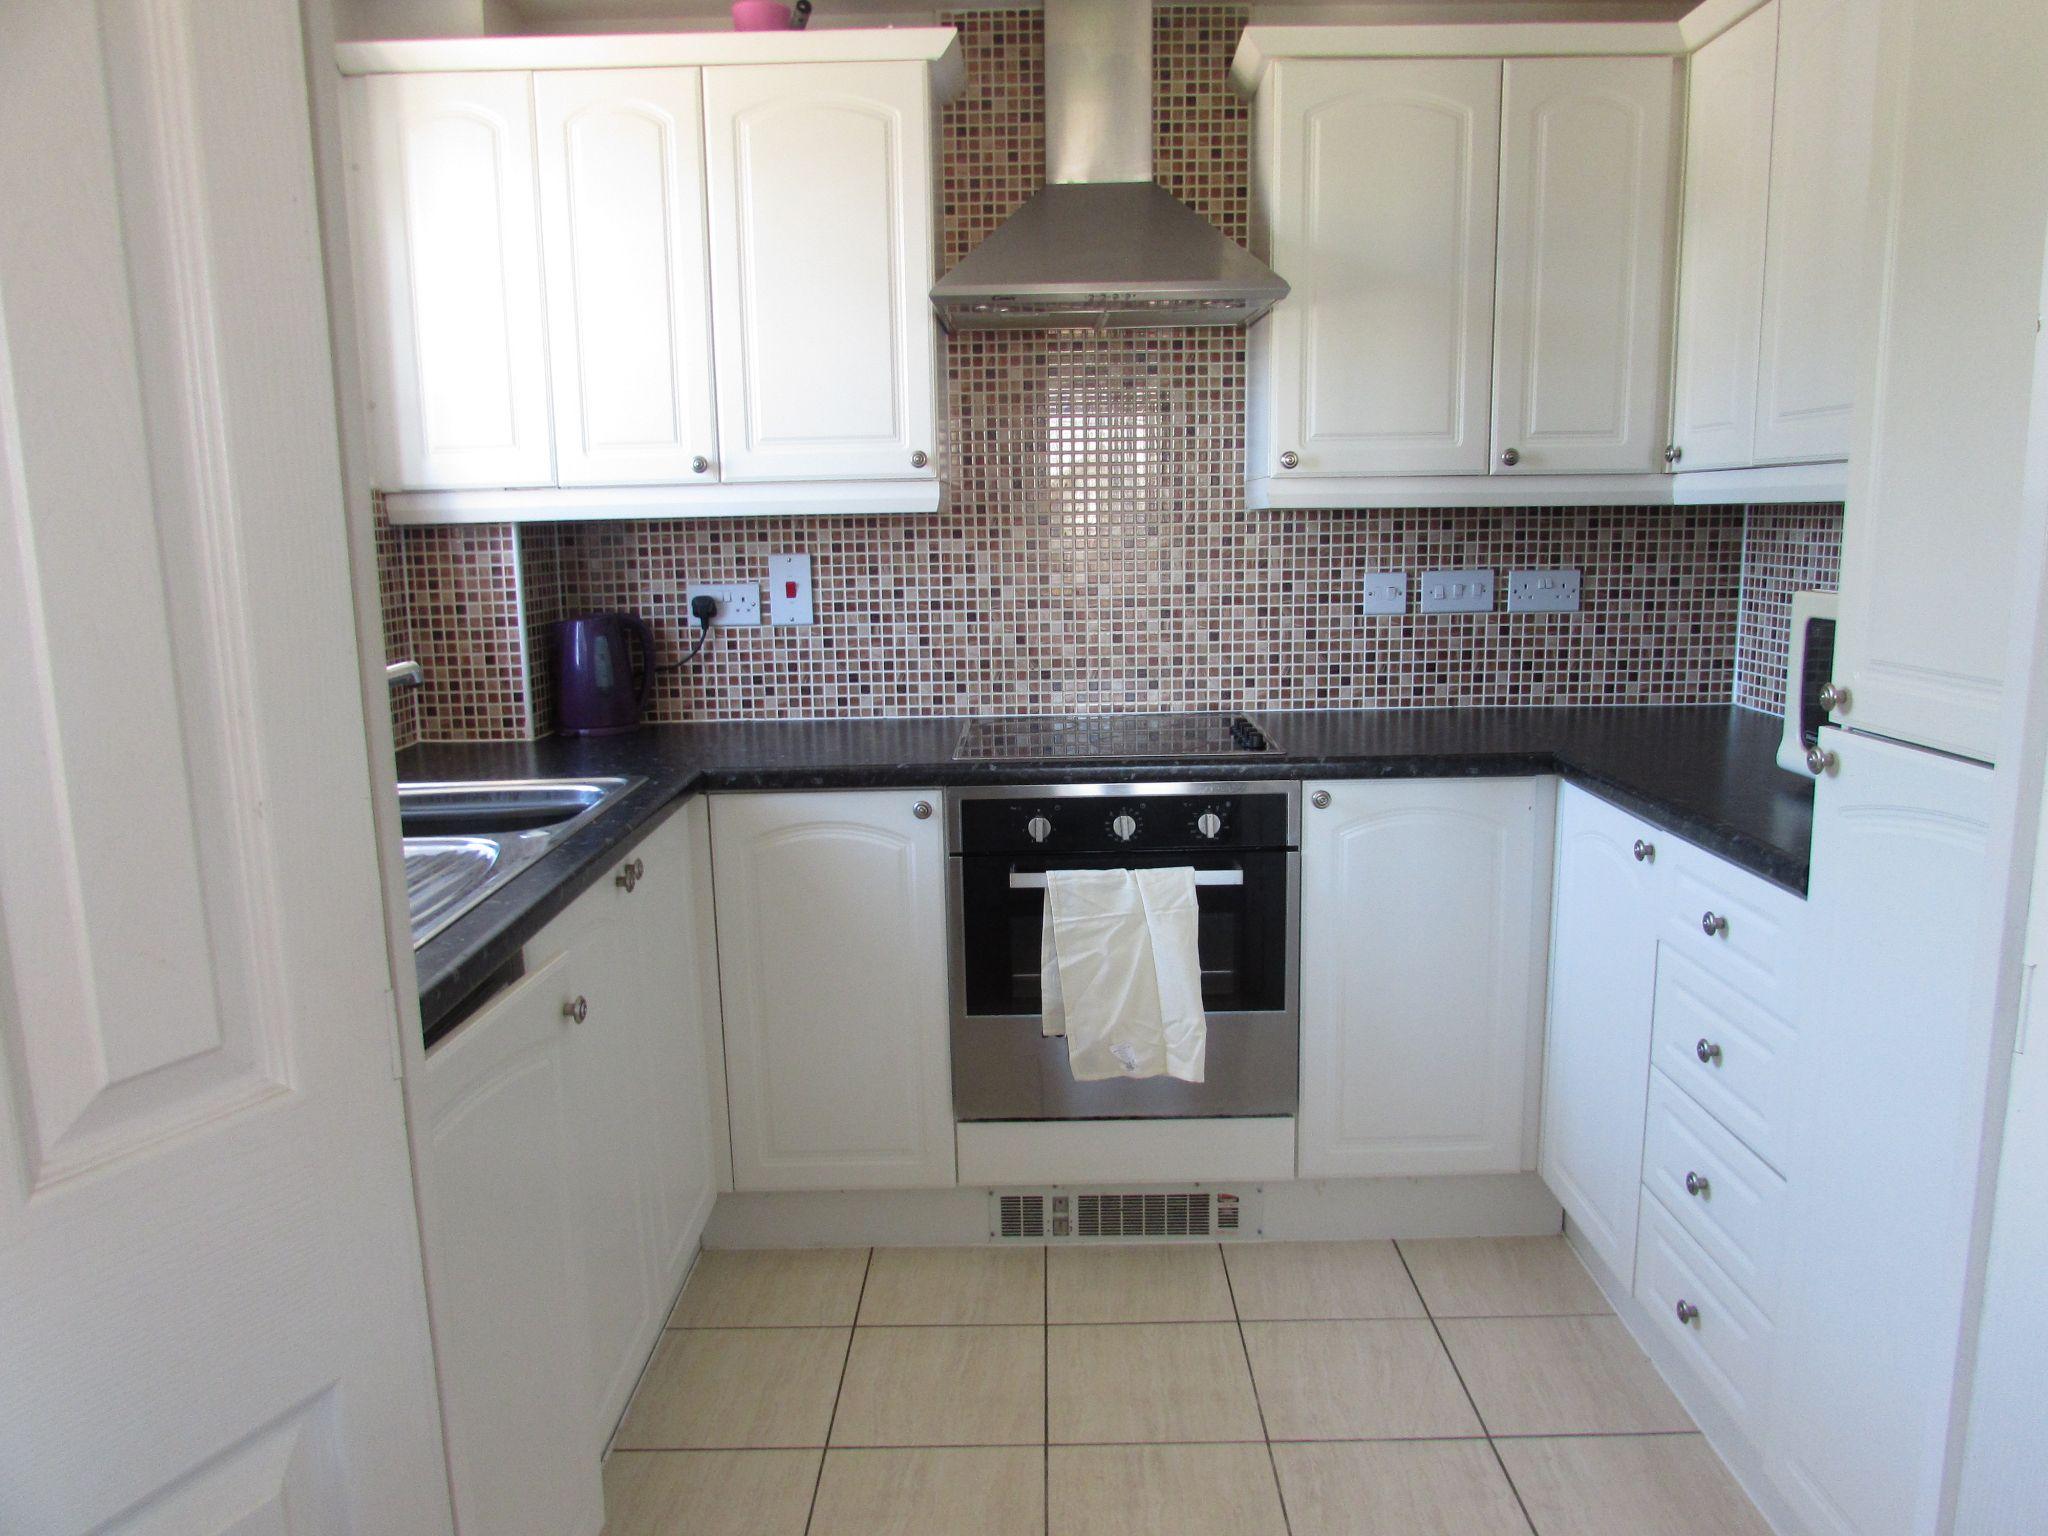 2 Bedroom Apartment Flat/apartment To Rent - kitchen